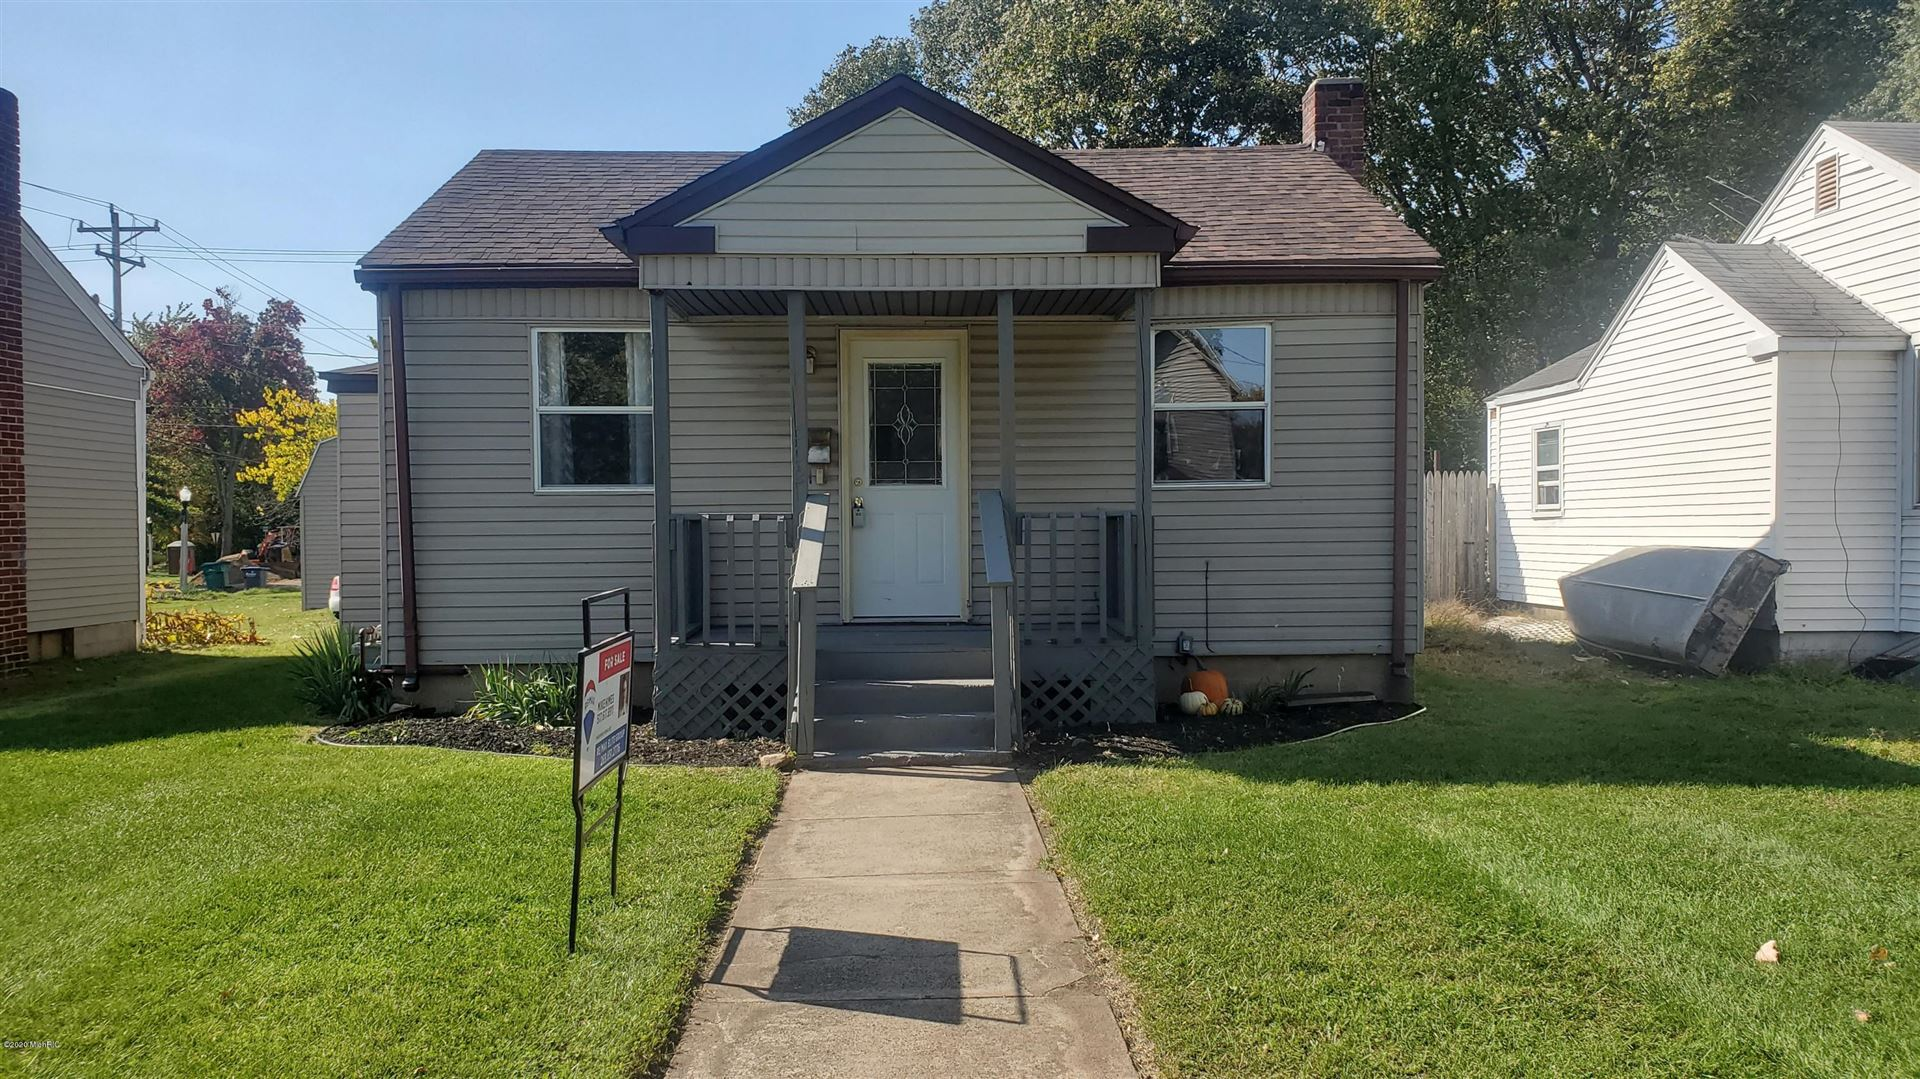 502 Center Street, Sturgis, MI 49091 - MLS#: 20033346